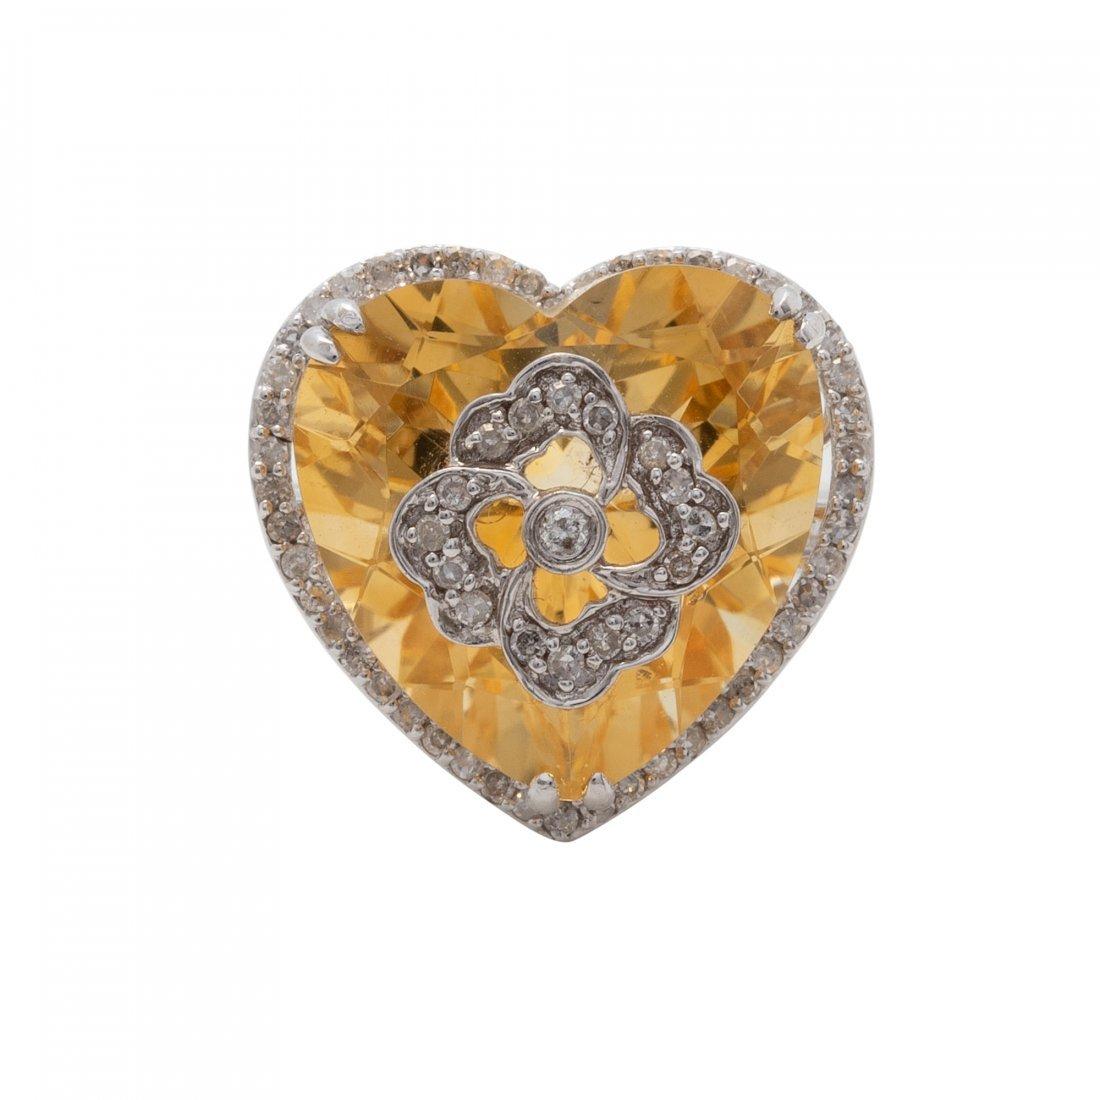 Interesting Citrine and Diamond Ring